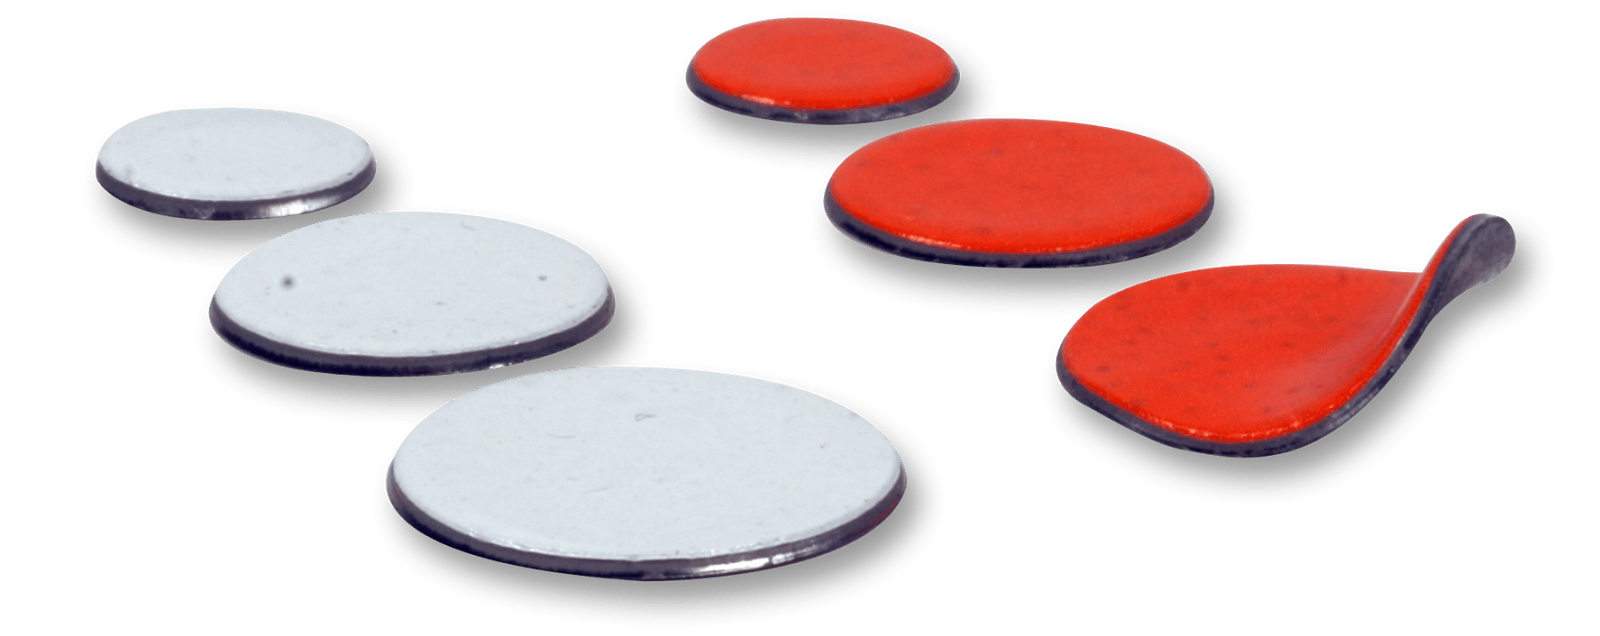 power dots strike pro купить